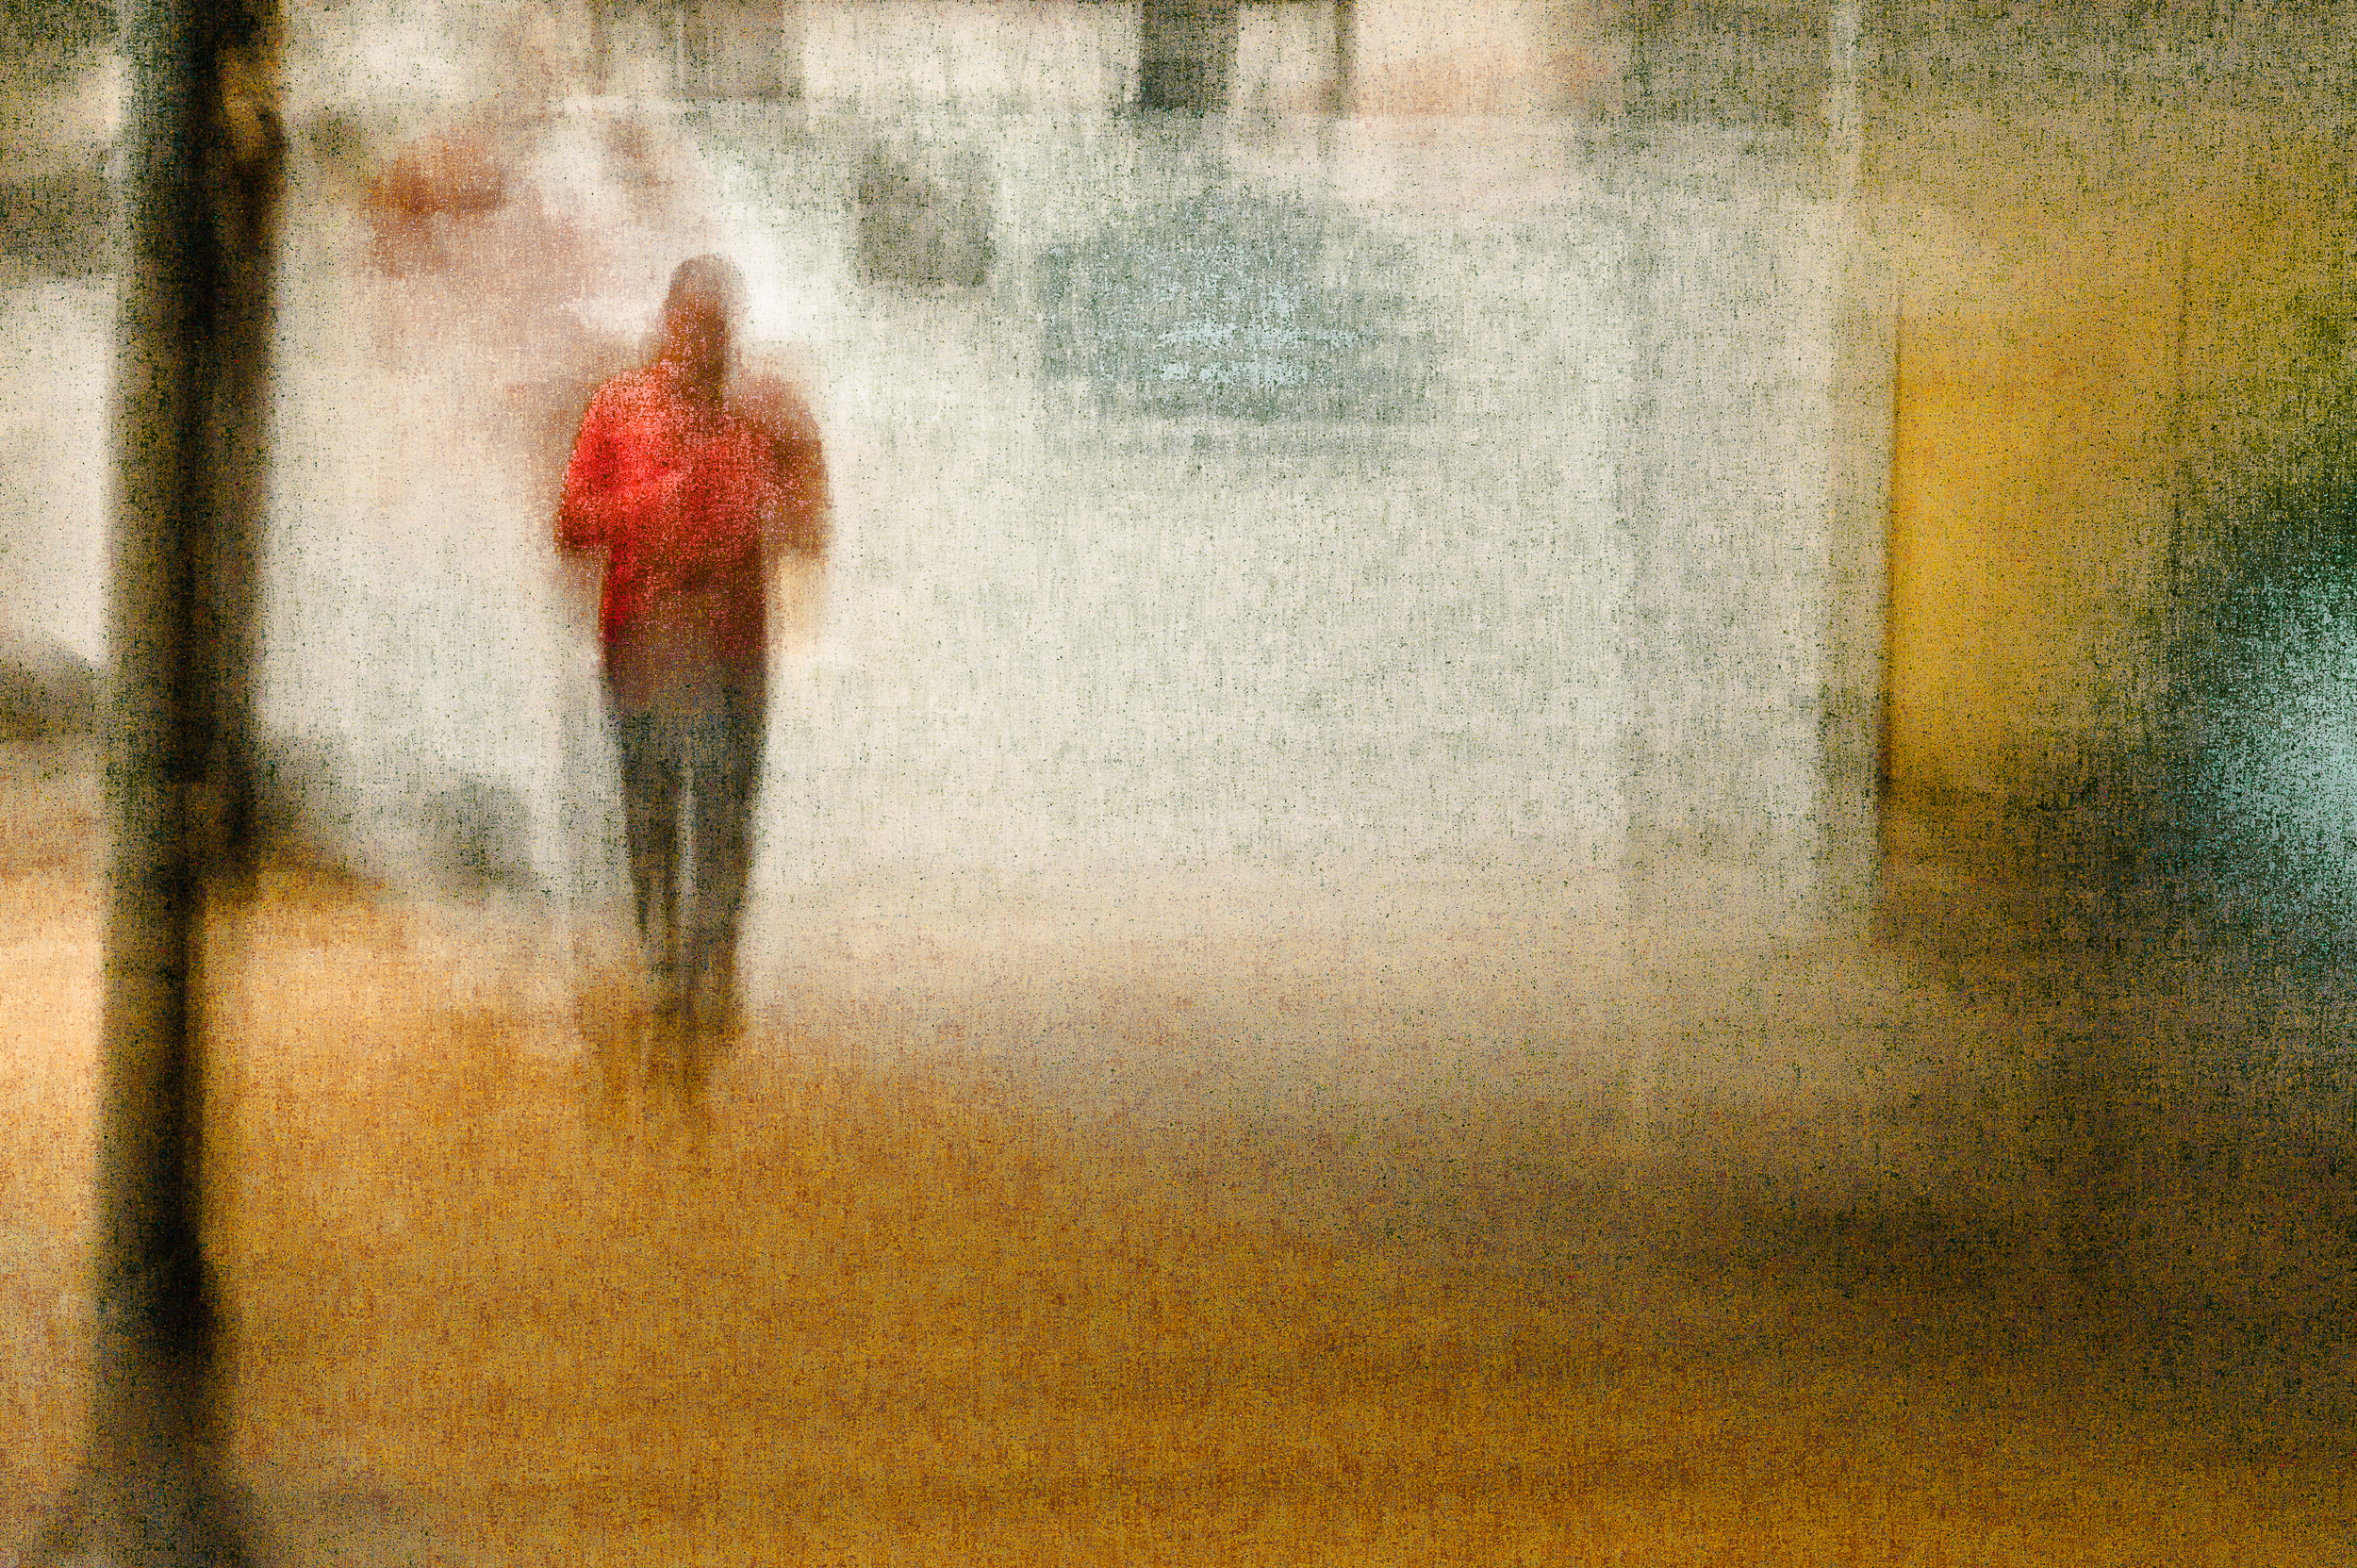 Urban Figure no. 5273 - Red Shirt